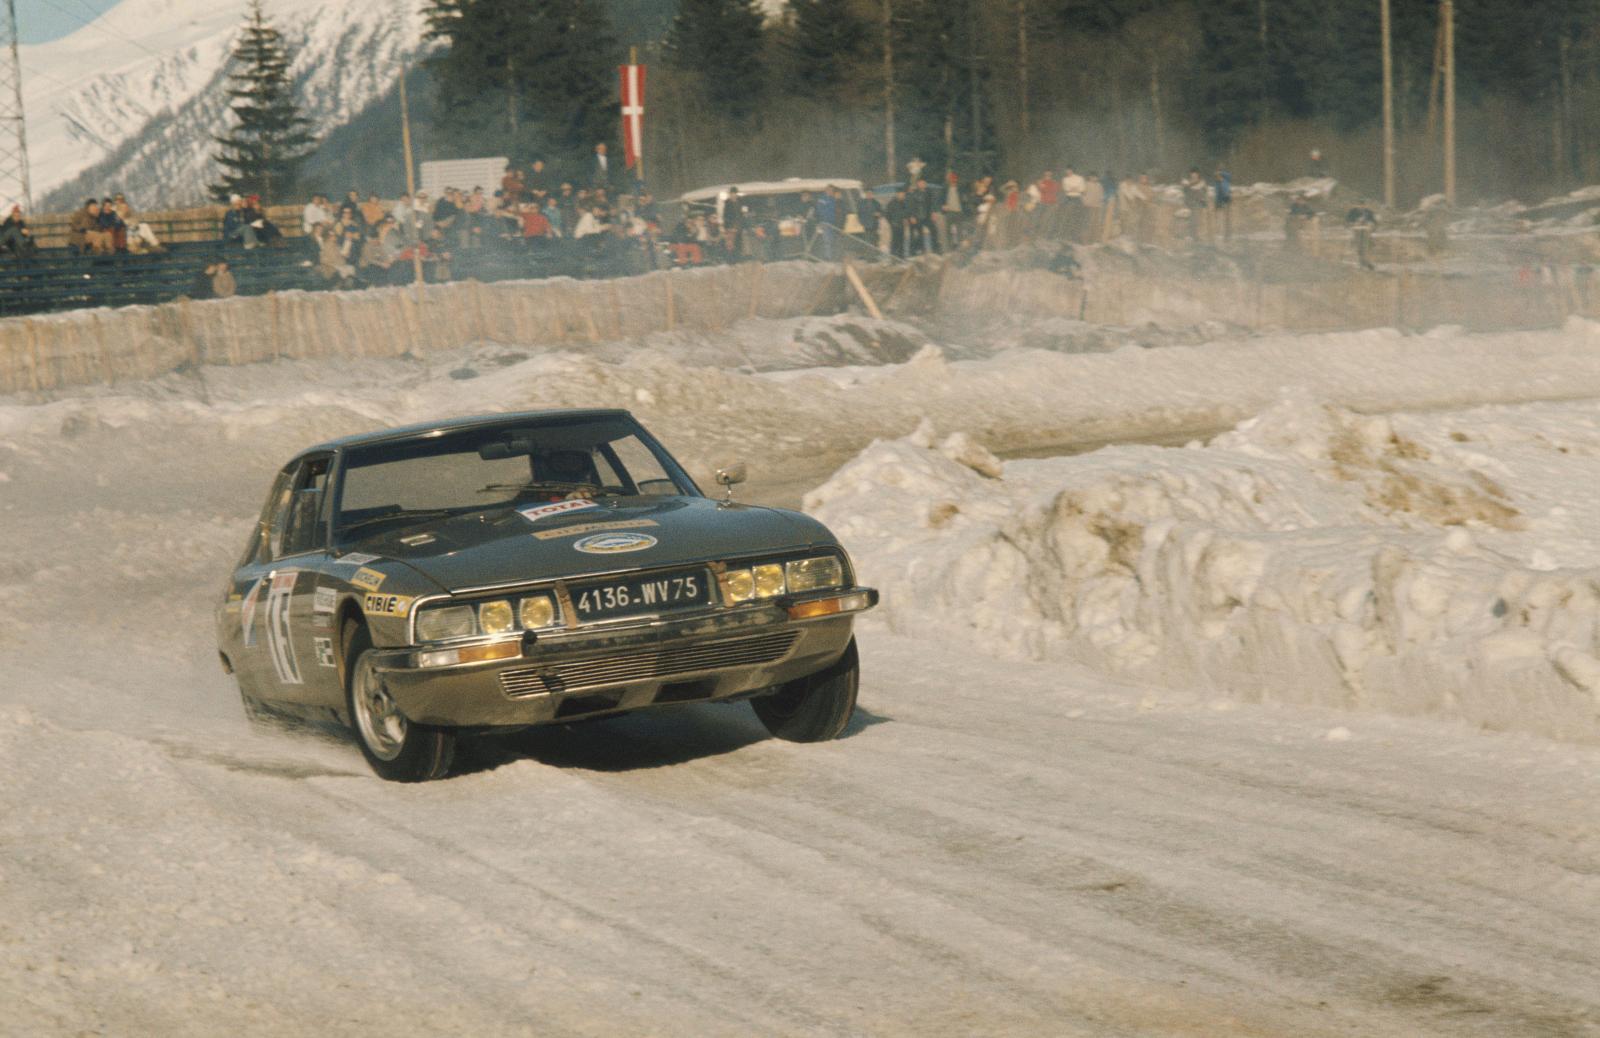 Chamonix Otomobil Yarış - SM - 1972 - arkadan görünüm